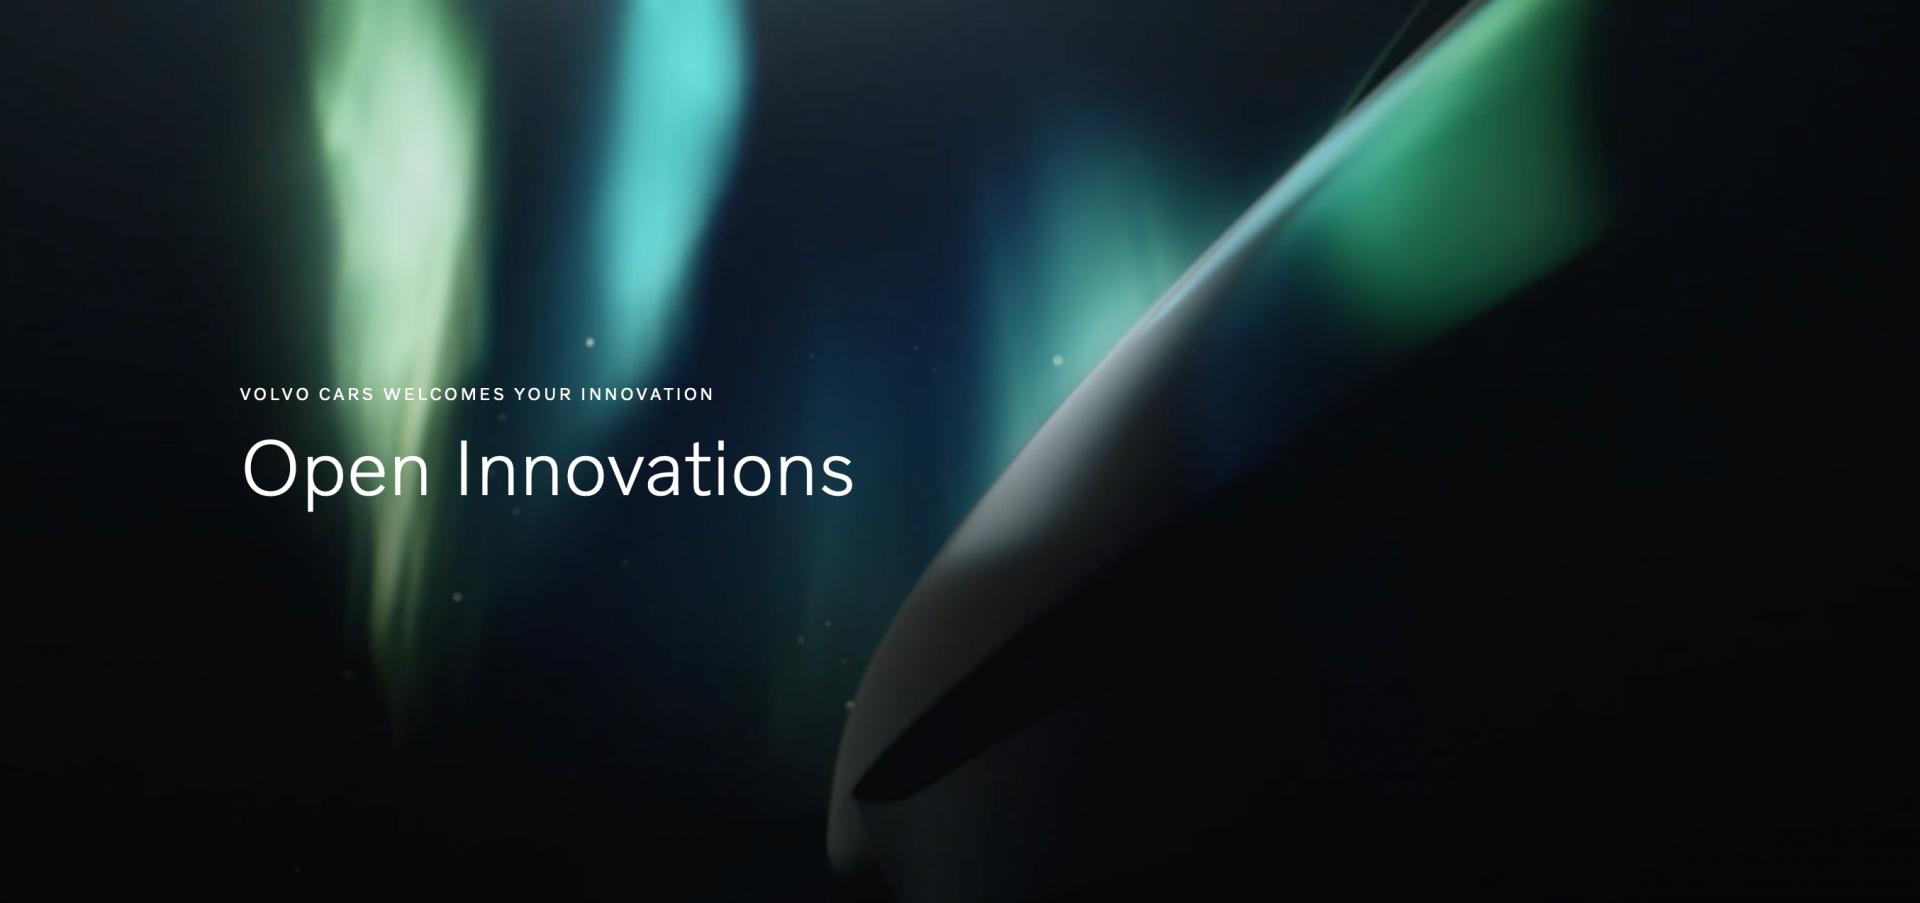 Open Innovations